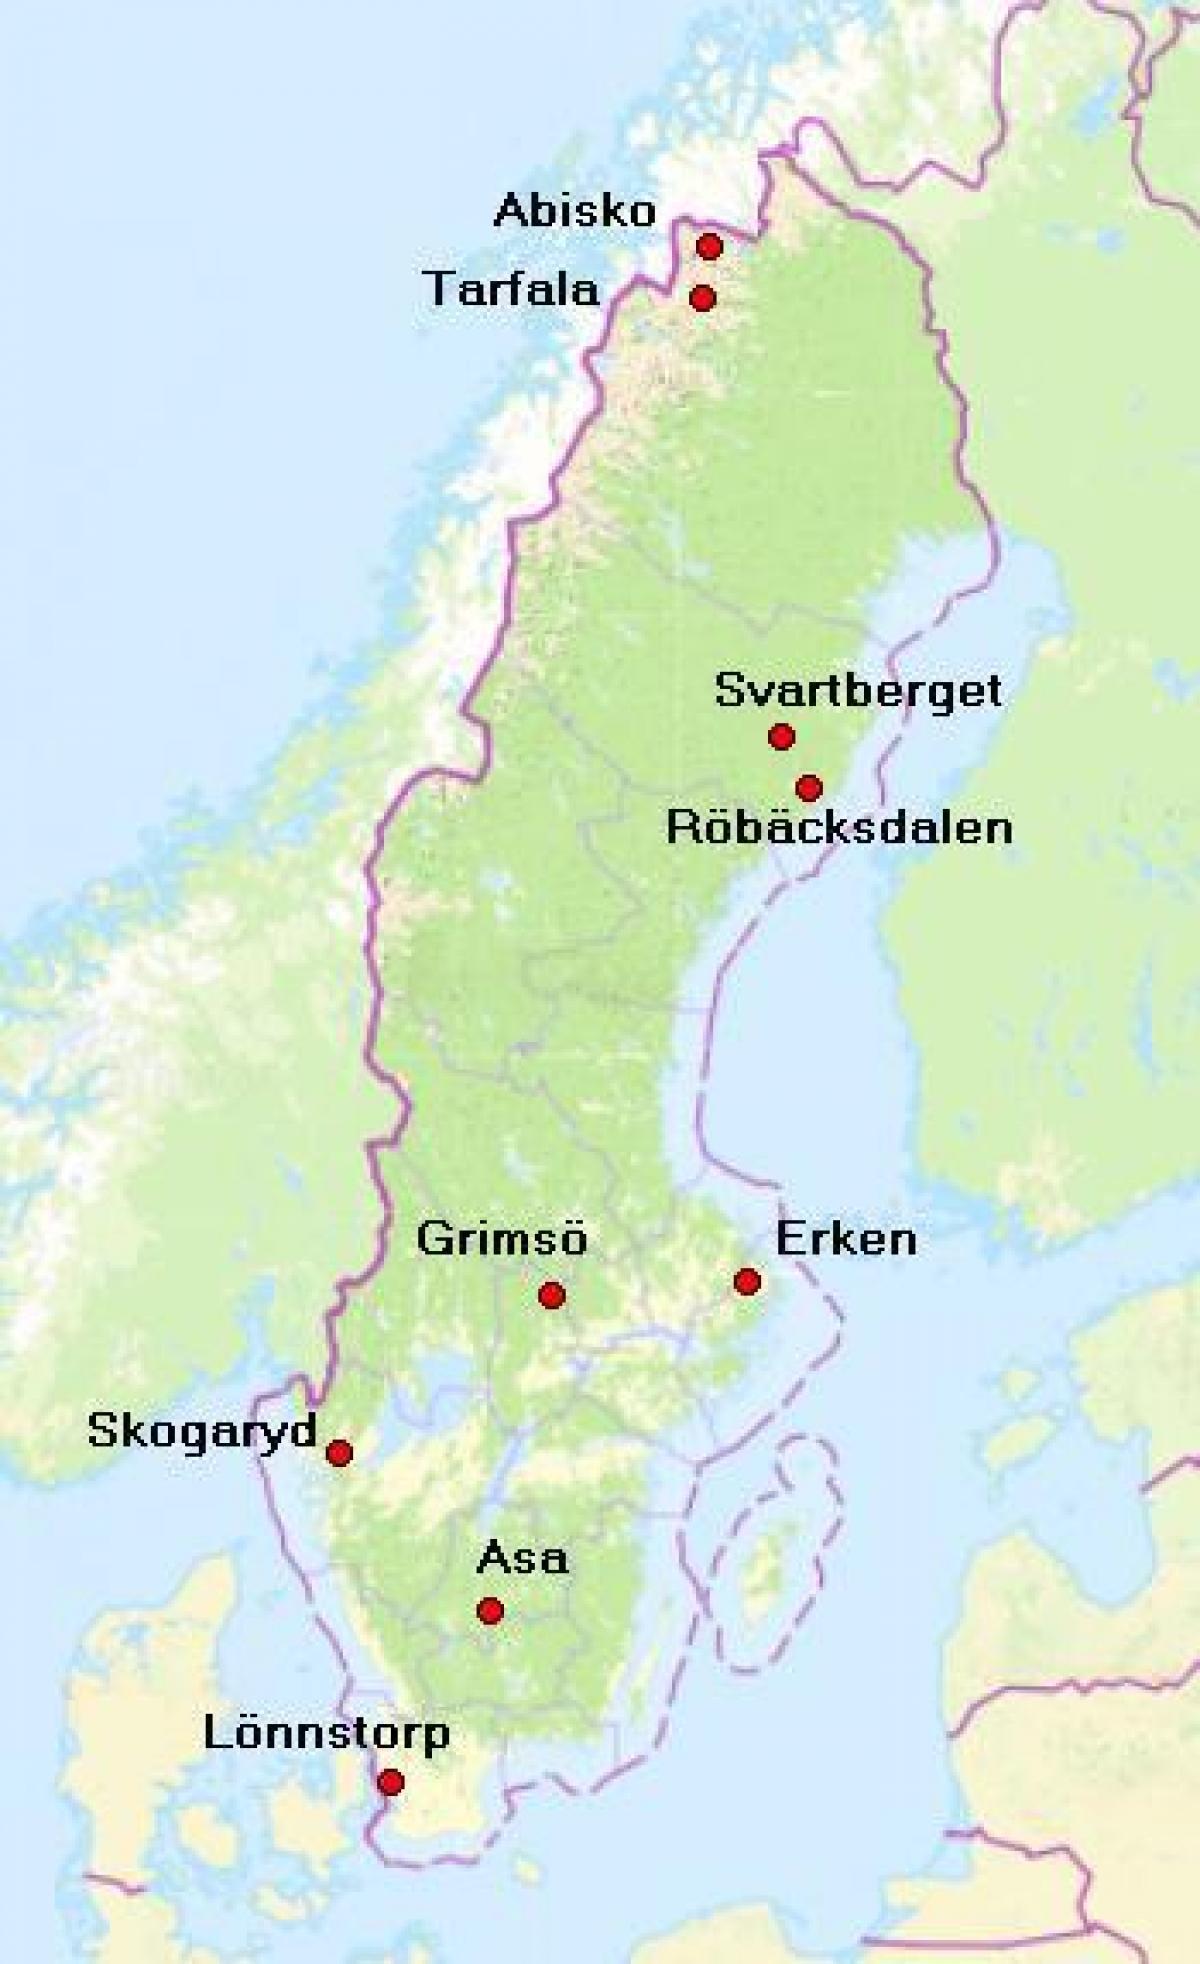 Karta Riksgransen Abisko.Abisko Karta